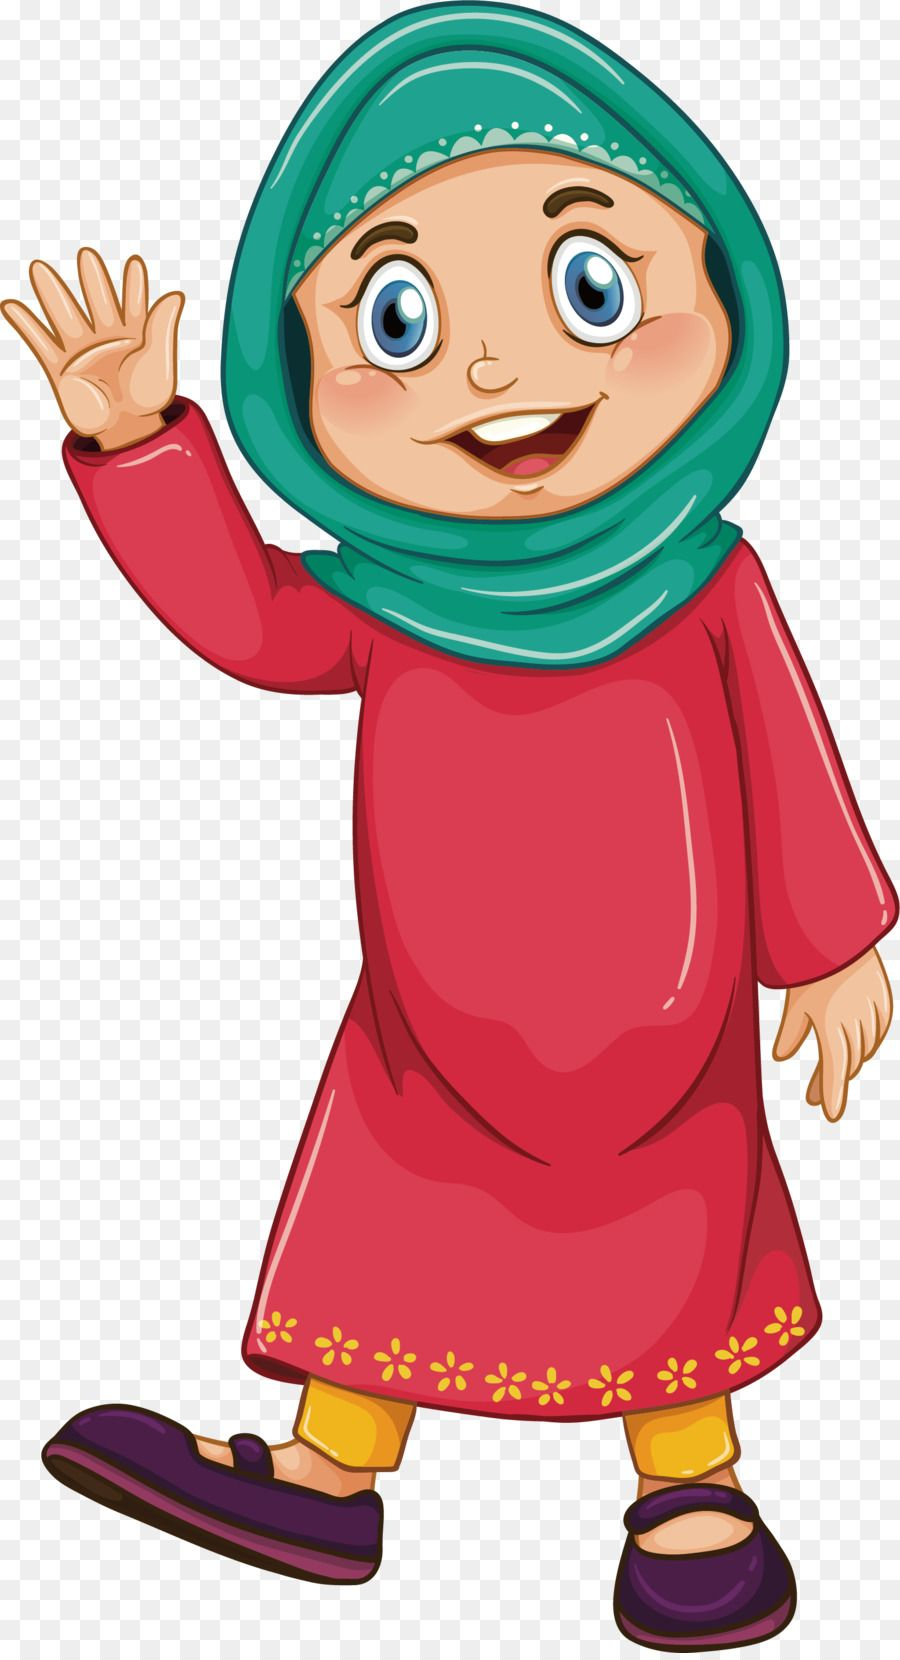 Muslim Girl Islam Clip Art Red Robed Islamic Women Png Is About Is About Boy Art Outerwear Human Behavior Child Muslim Girl Kartun Disney Kartun Disney